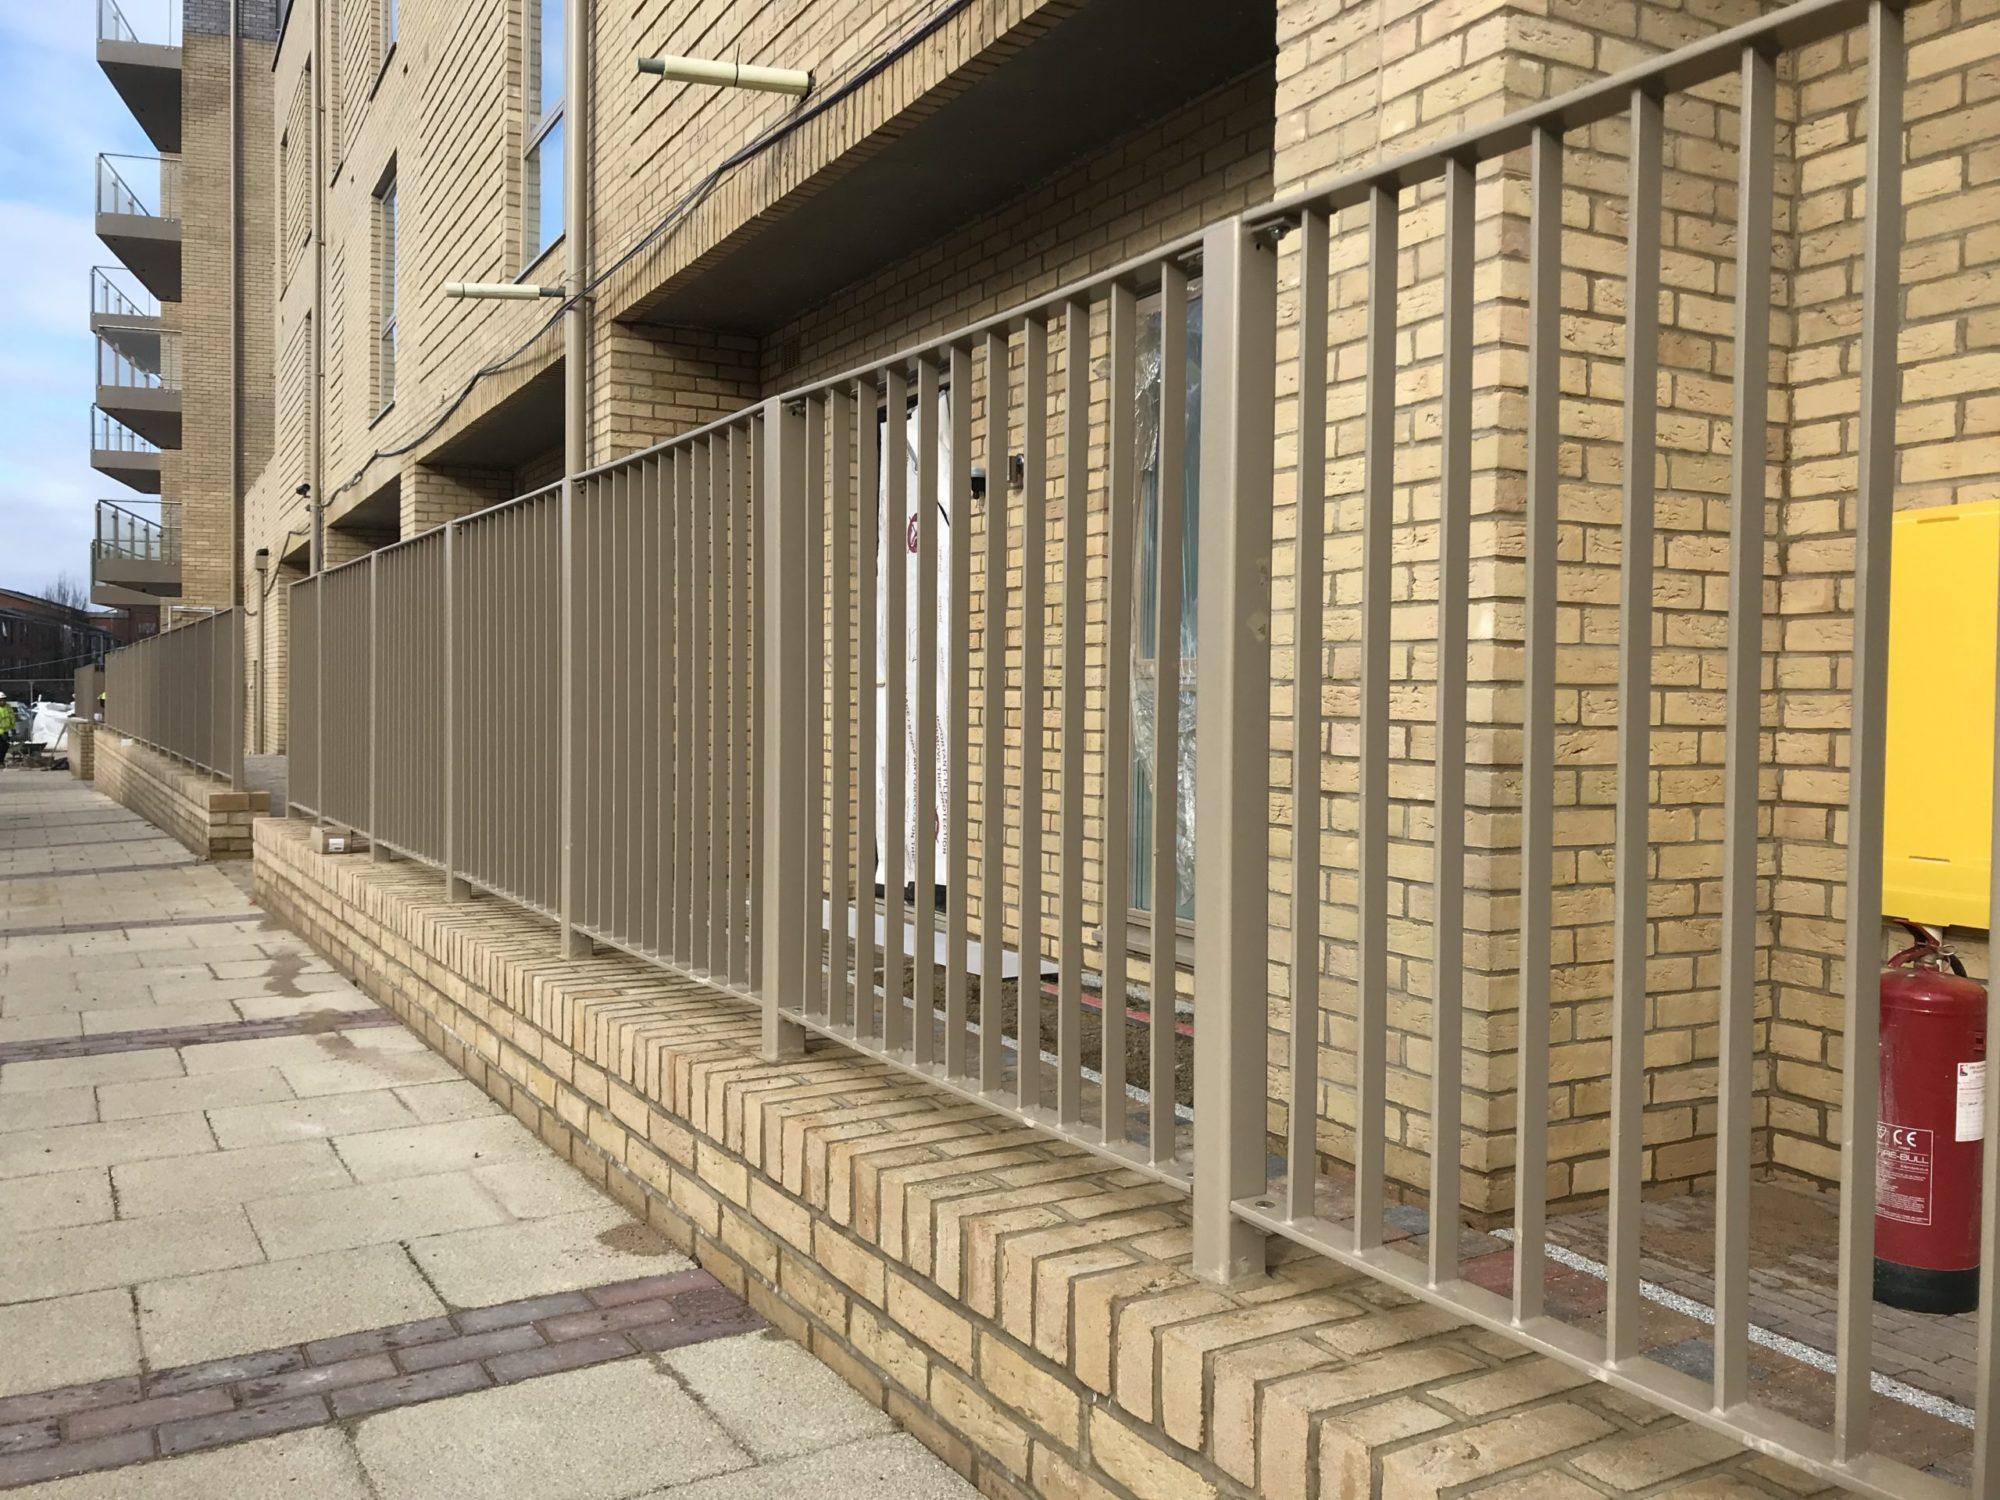 Stonebridge Estate flat bar infill railings